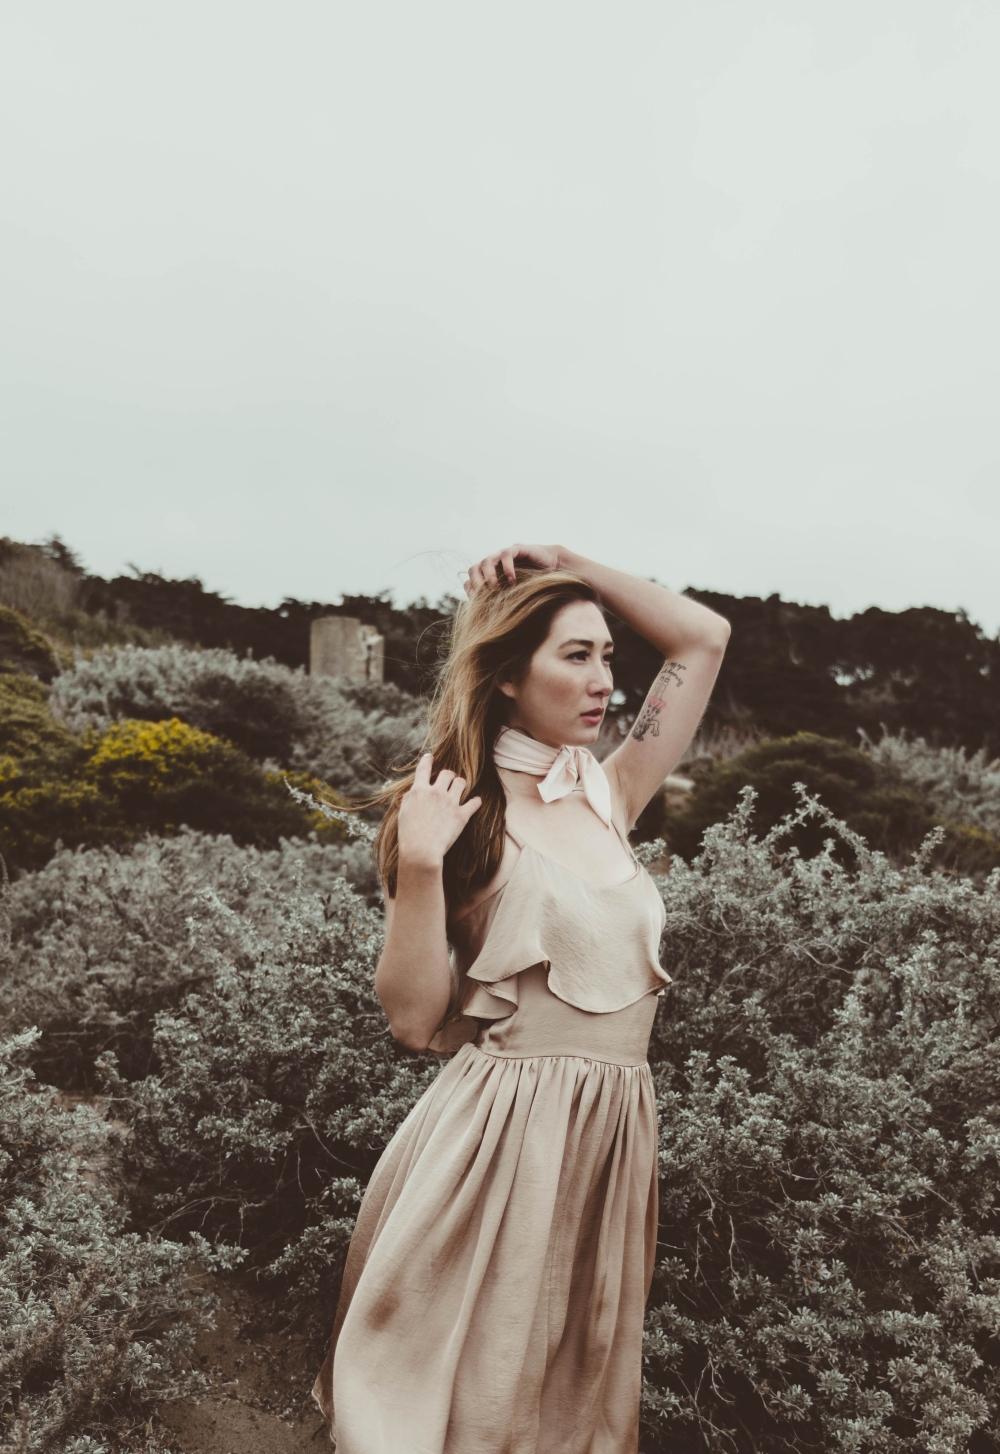 coastal-drifter-alyssa-nicole-emma-dress-bronze-1